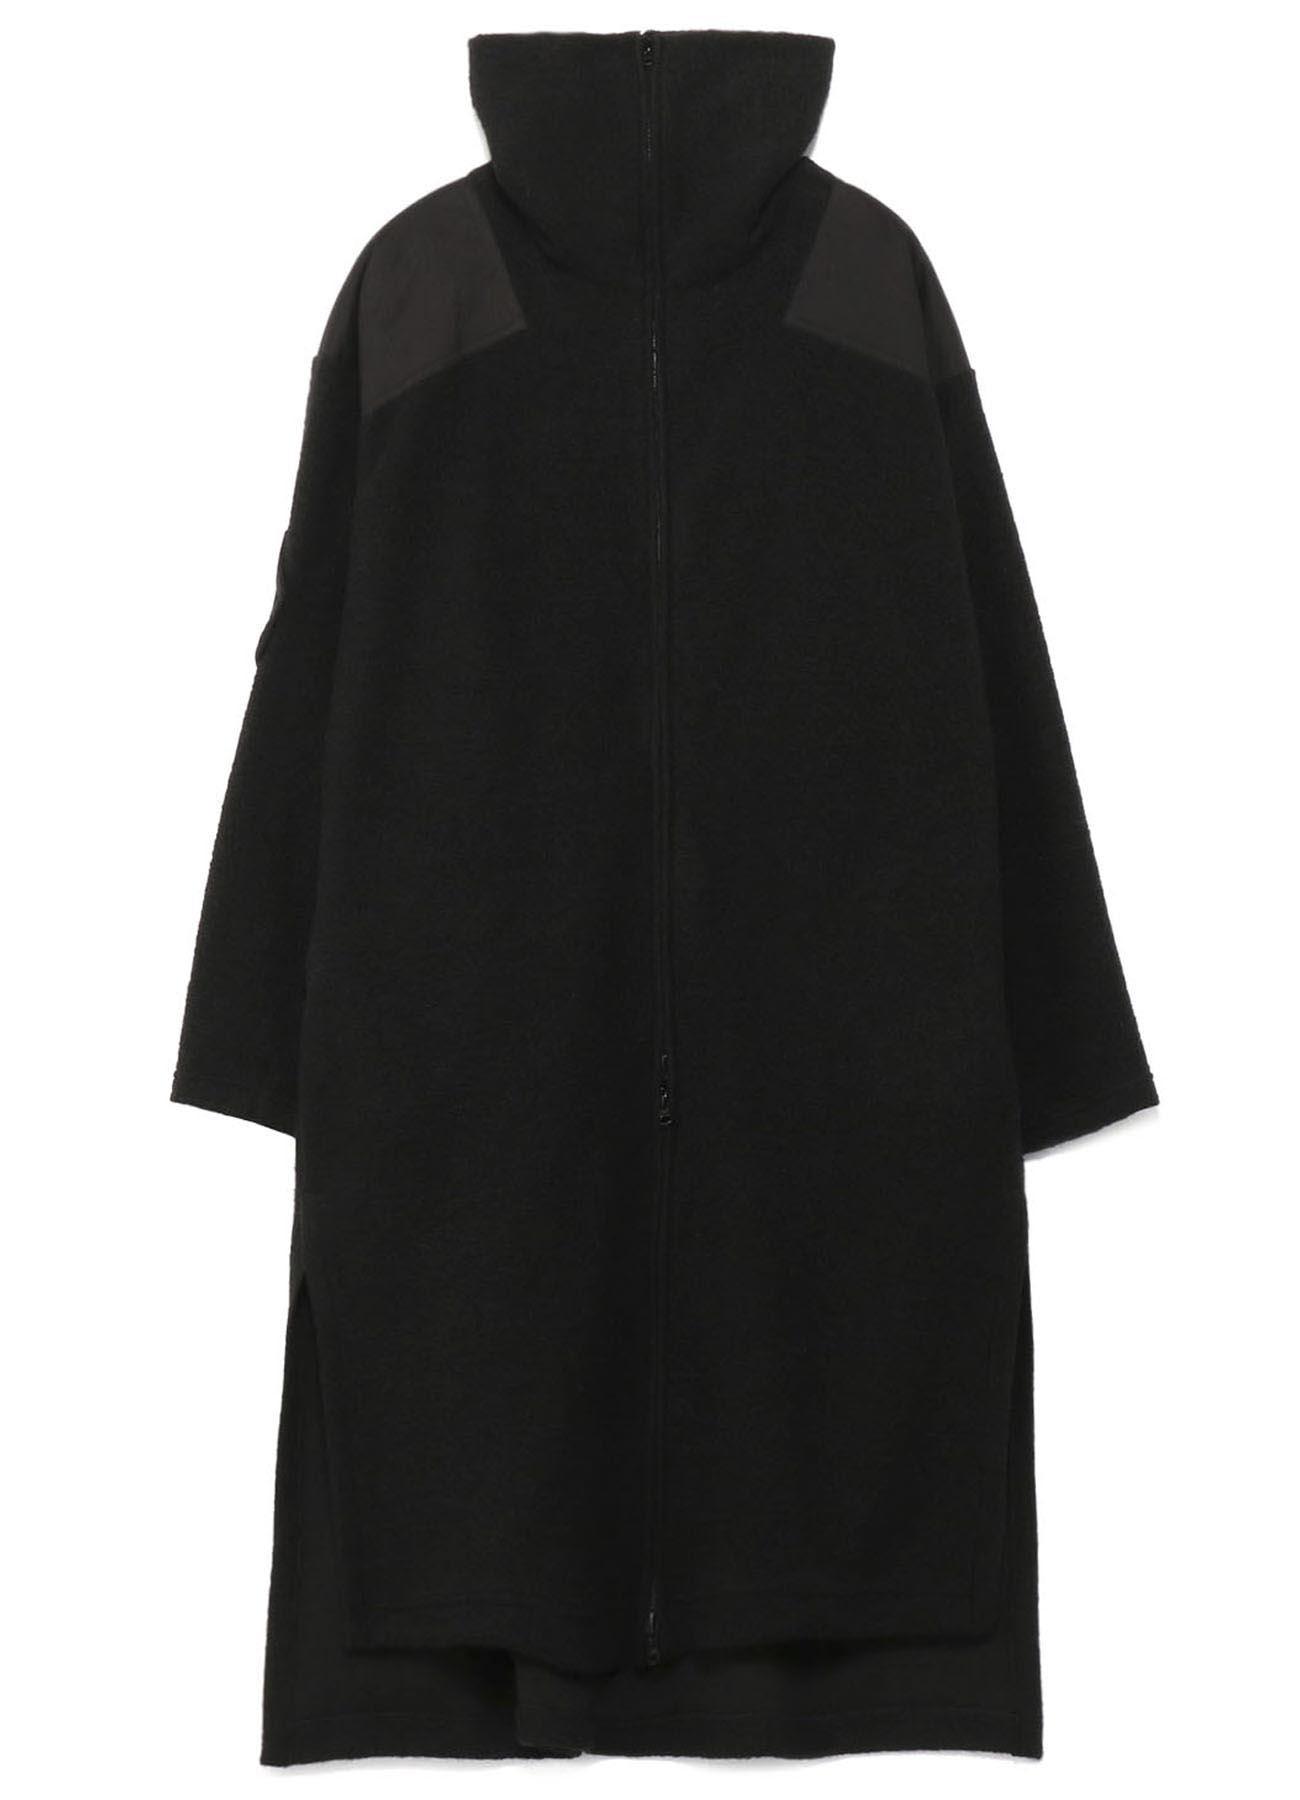 LIGHT MOLE SKIN x ITALIAN AIRY MOHAIR STAND COLLAR DRESS